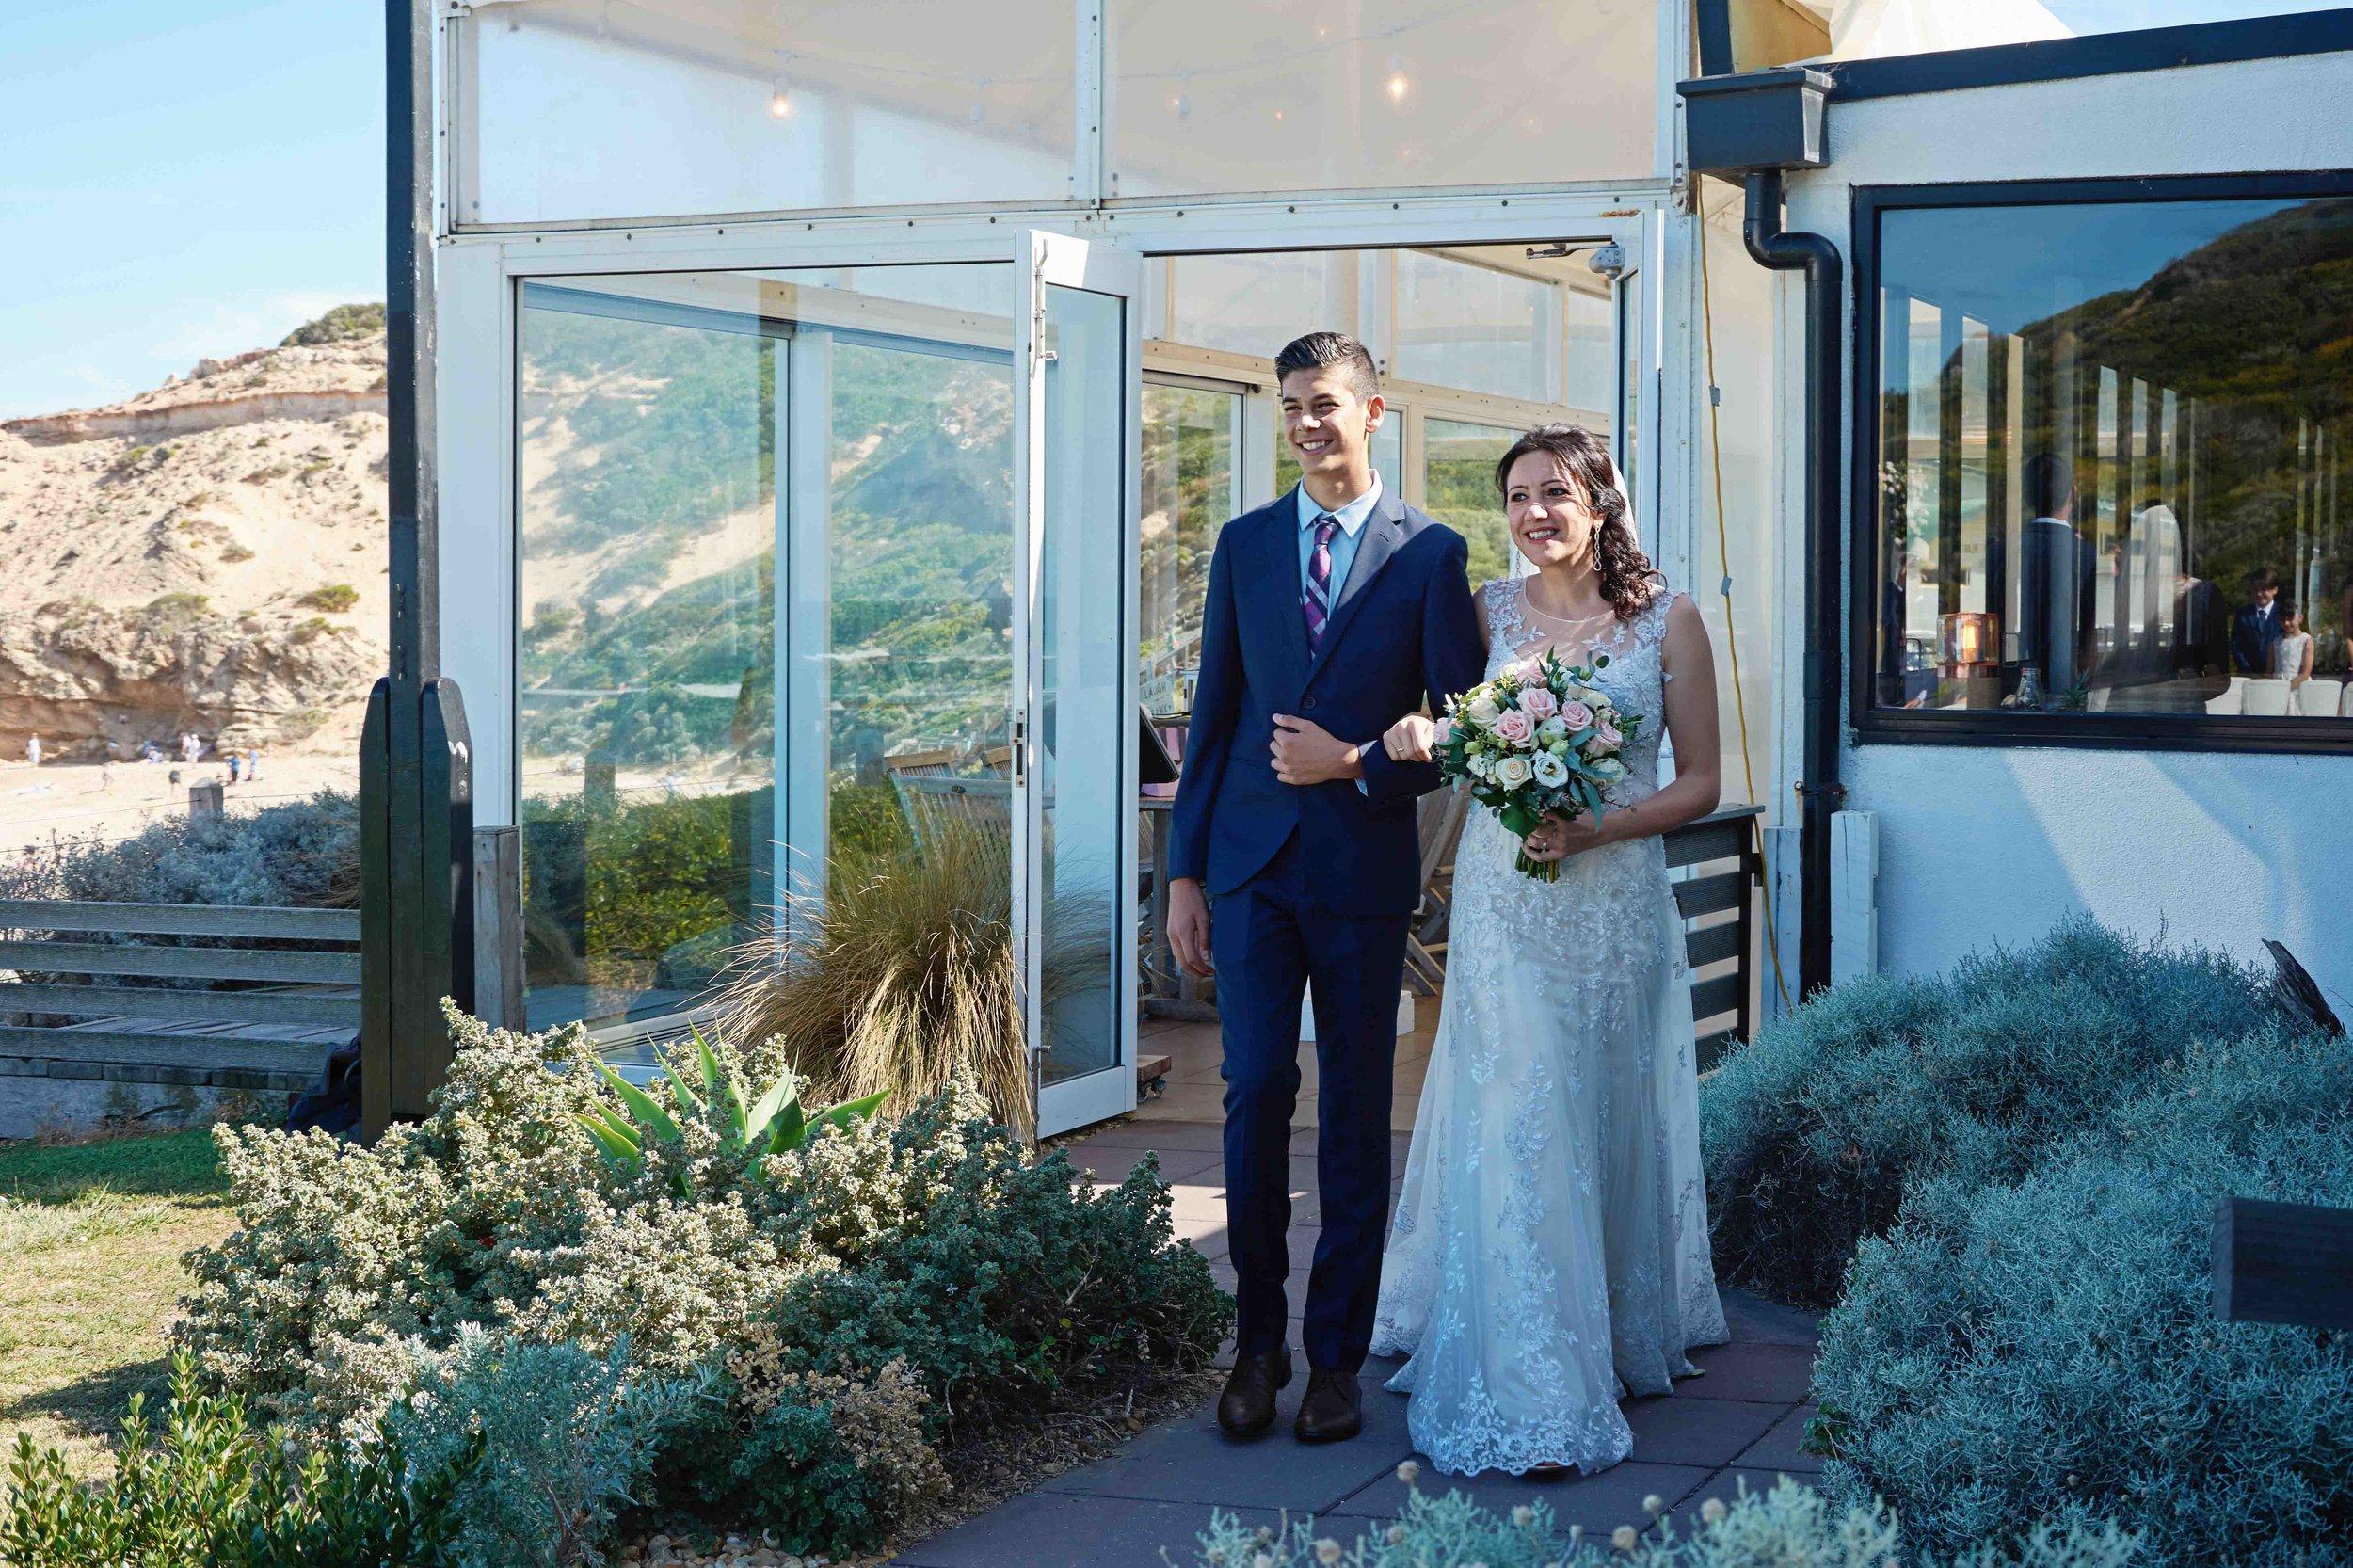 sorrento-wedding-photography-all-smiles-marissa-jade-photography-38.jpg